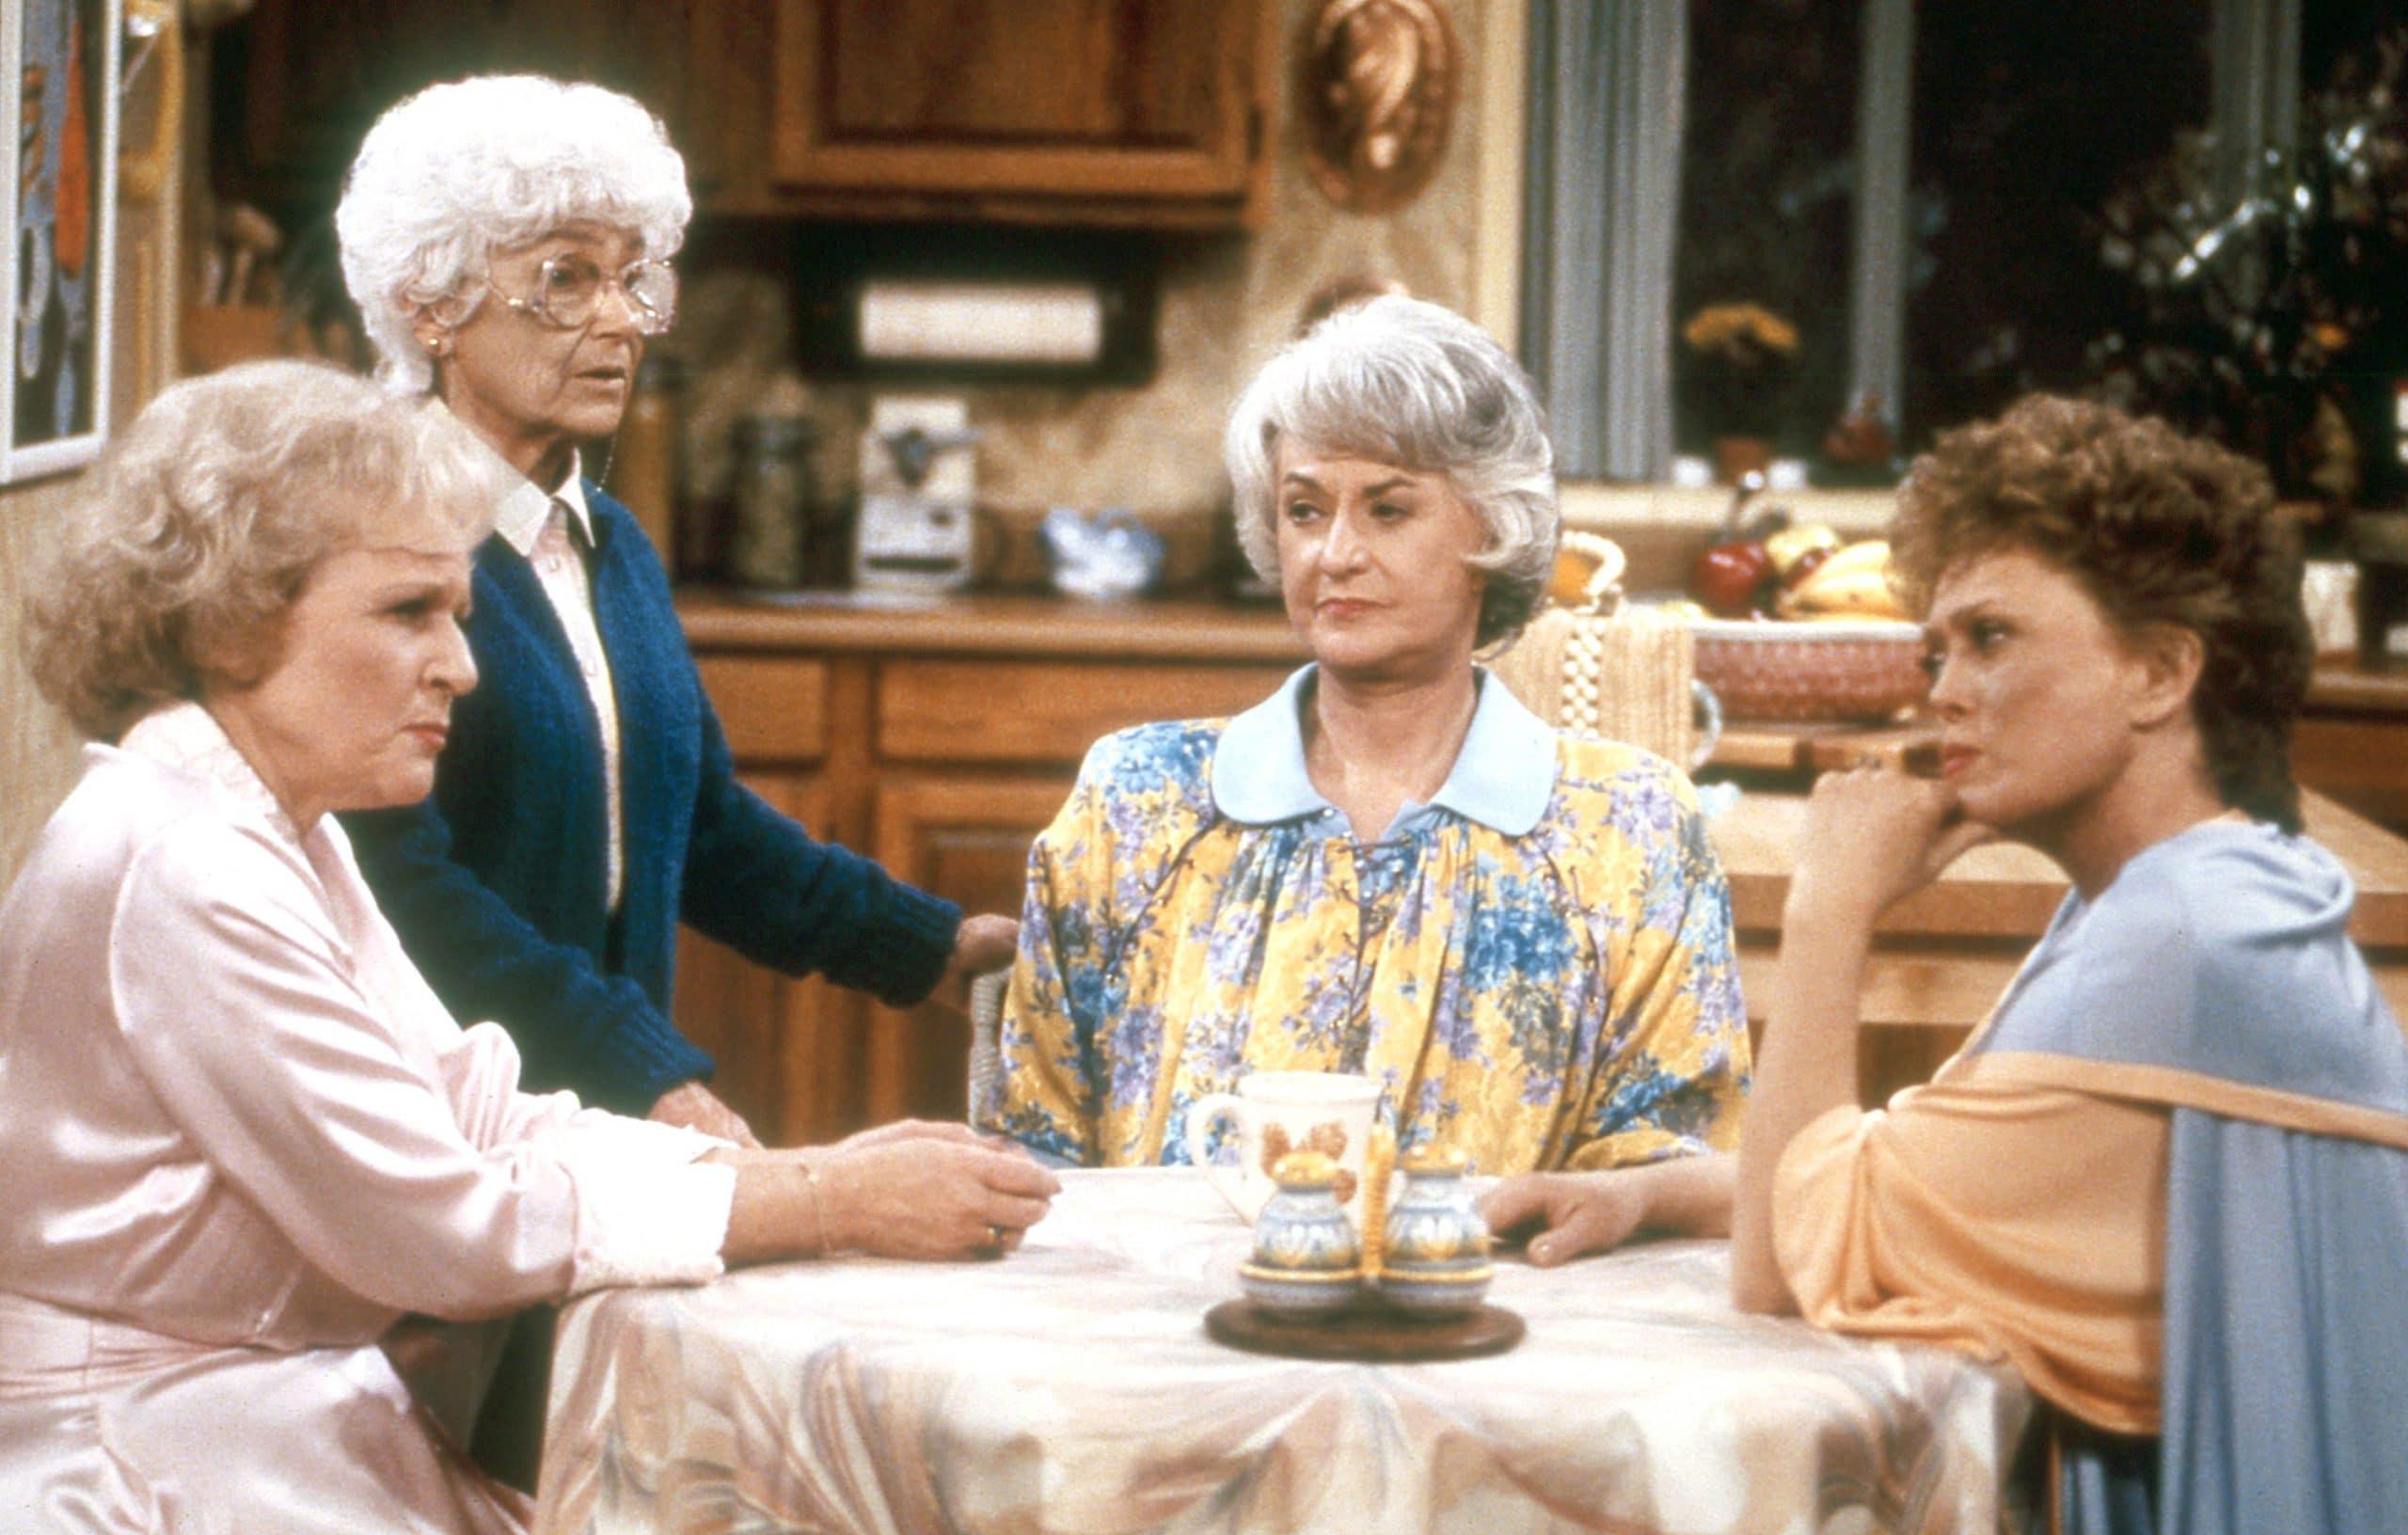 Betty White, Estelle Getty, Bea Arthur, Rue McClanahan